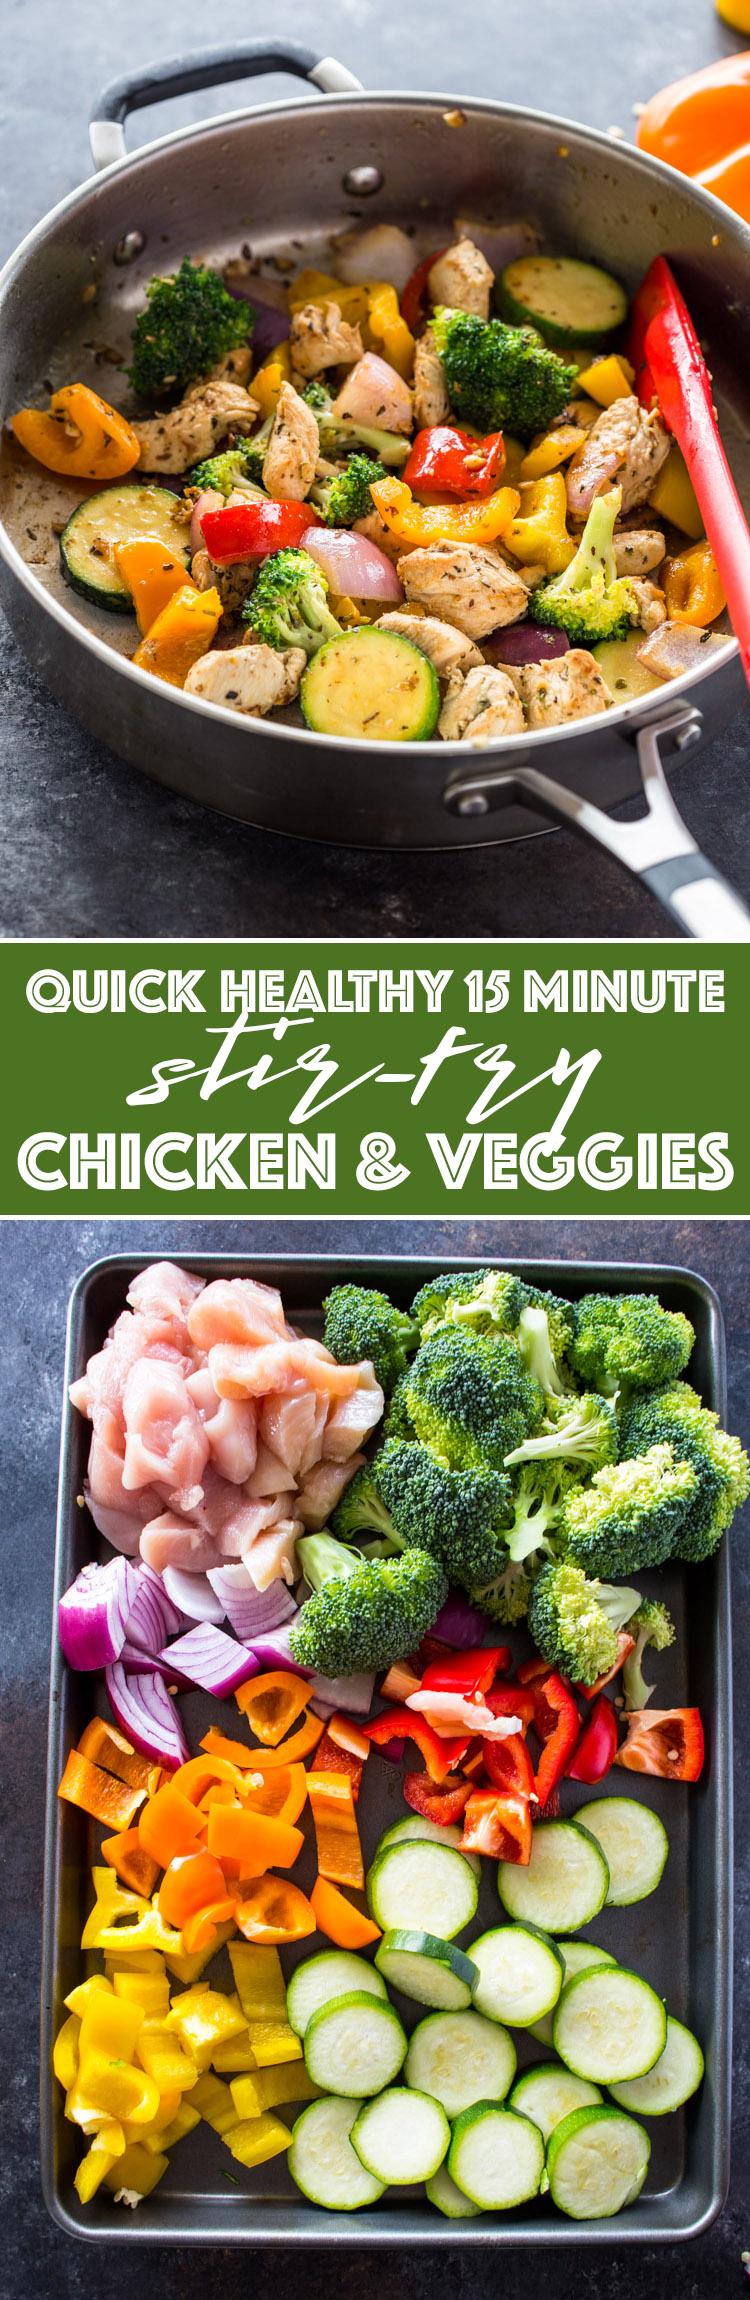 Quick Healthy 15 Minute Stir-Fry Chicken and Veggies